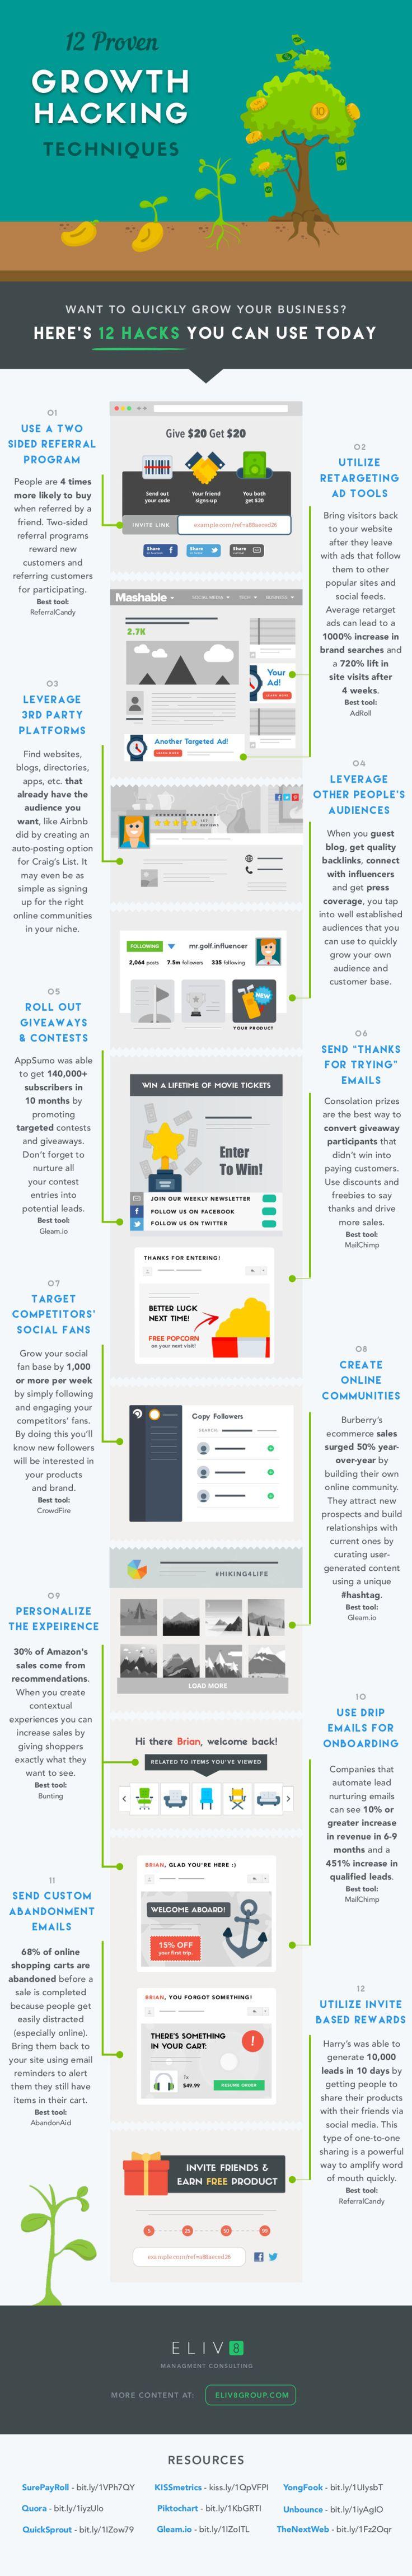 12 técnicas de Growth Hacking probadas #infografia #infographic #marketing - Business Startups